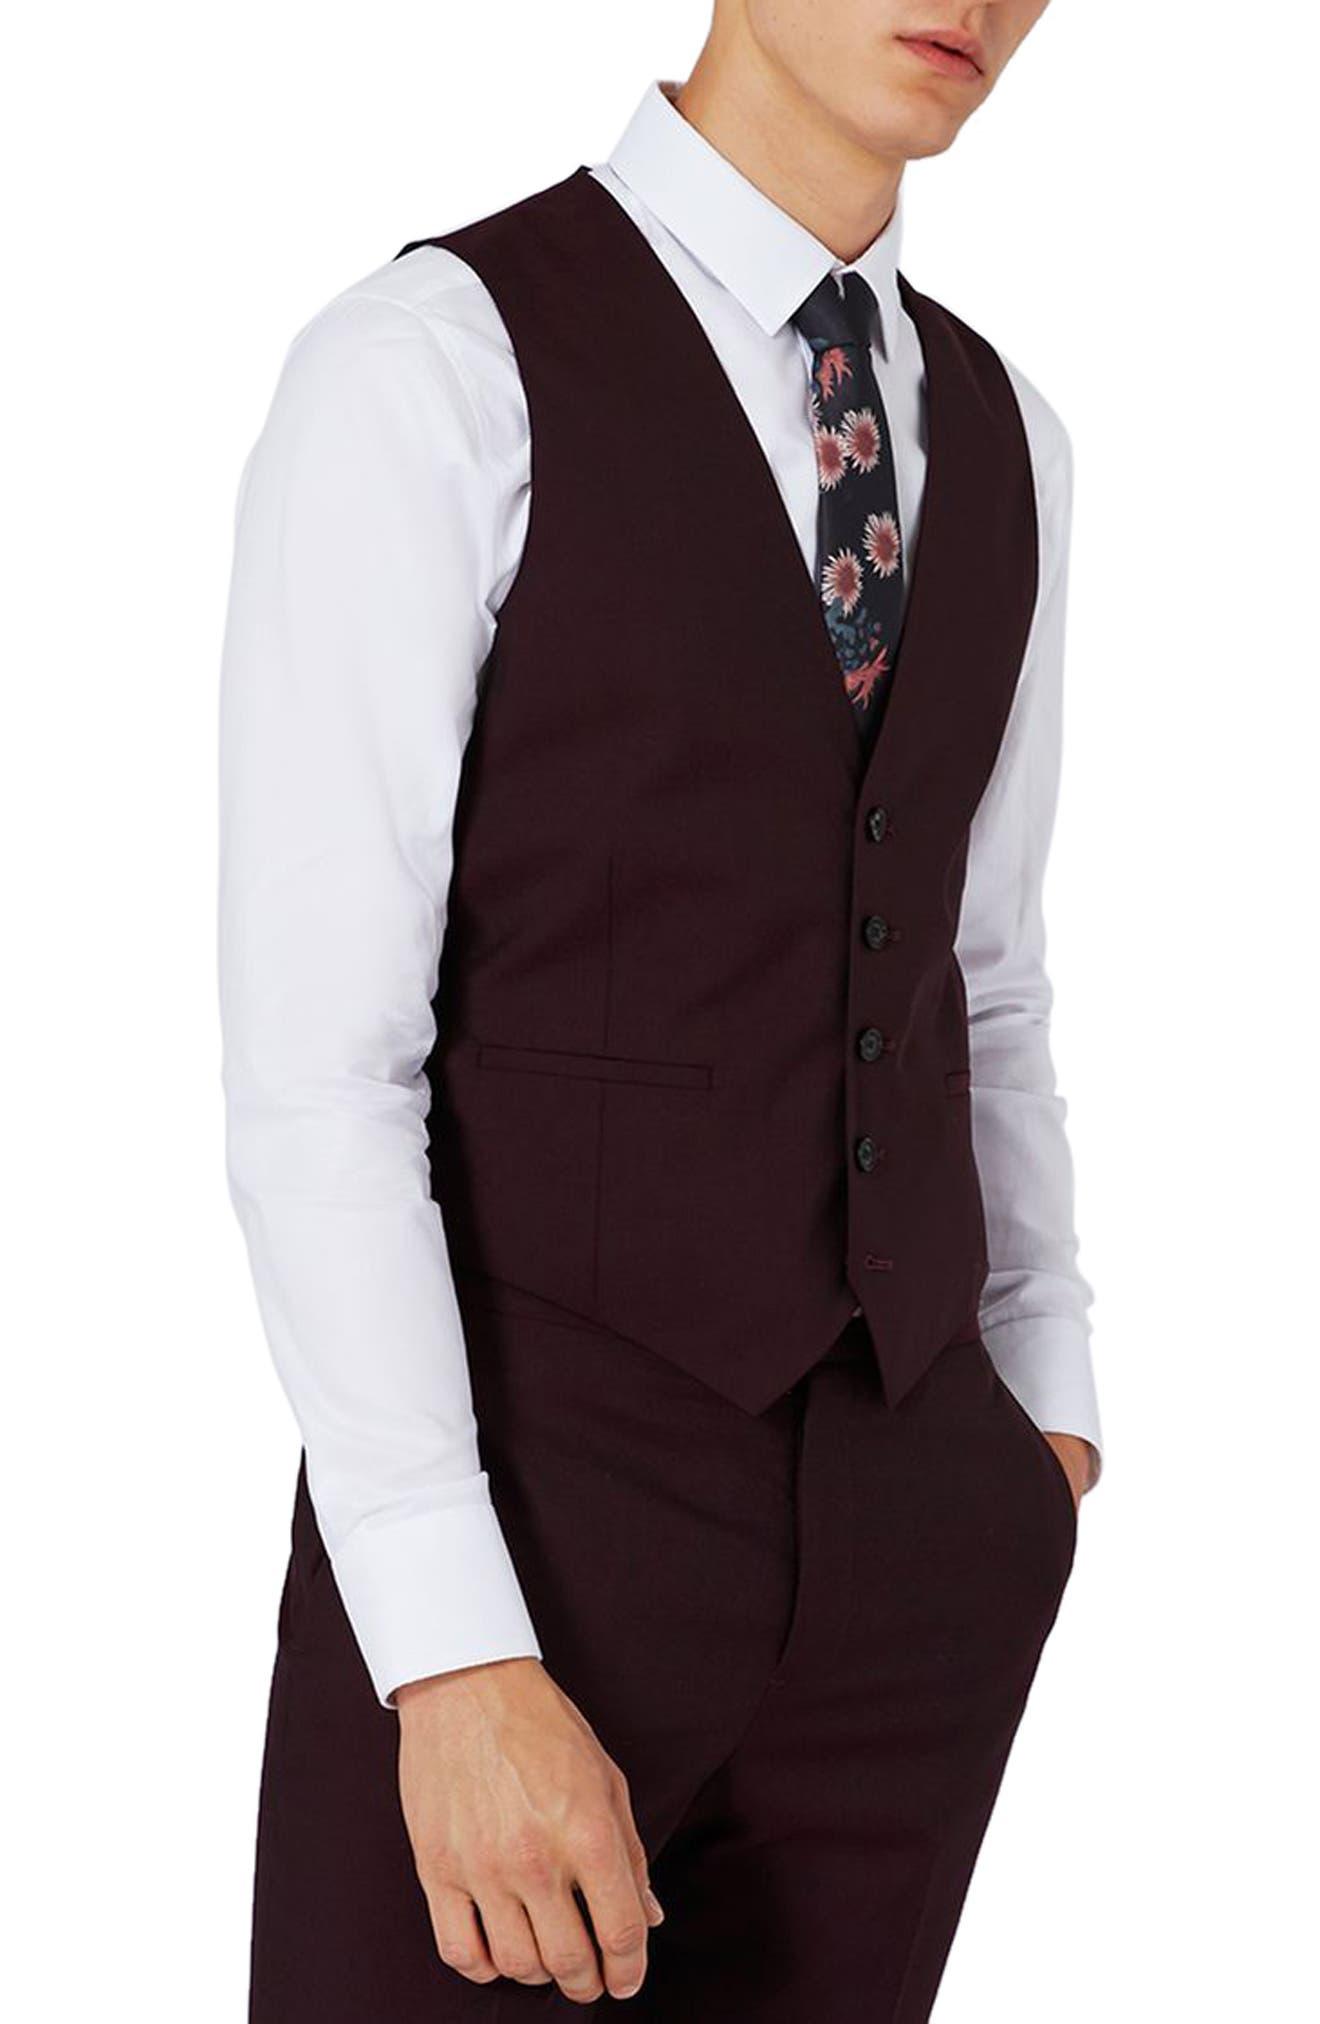 Main Image - Charlie Casely-Hayford x Topman Skinny Fit Vest